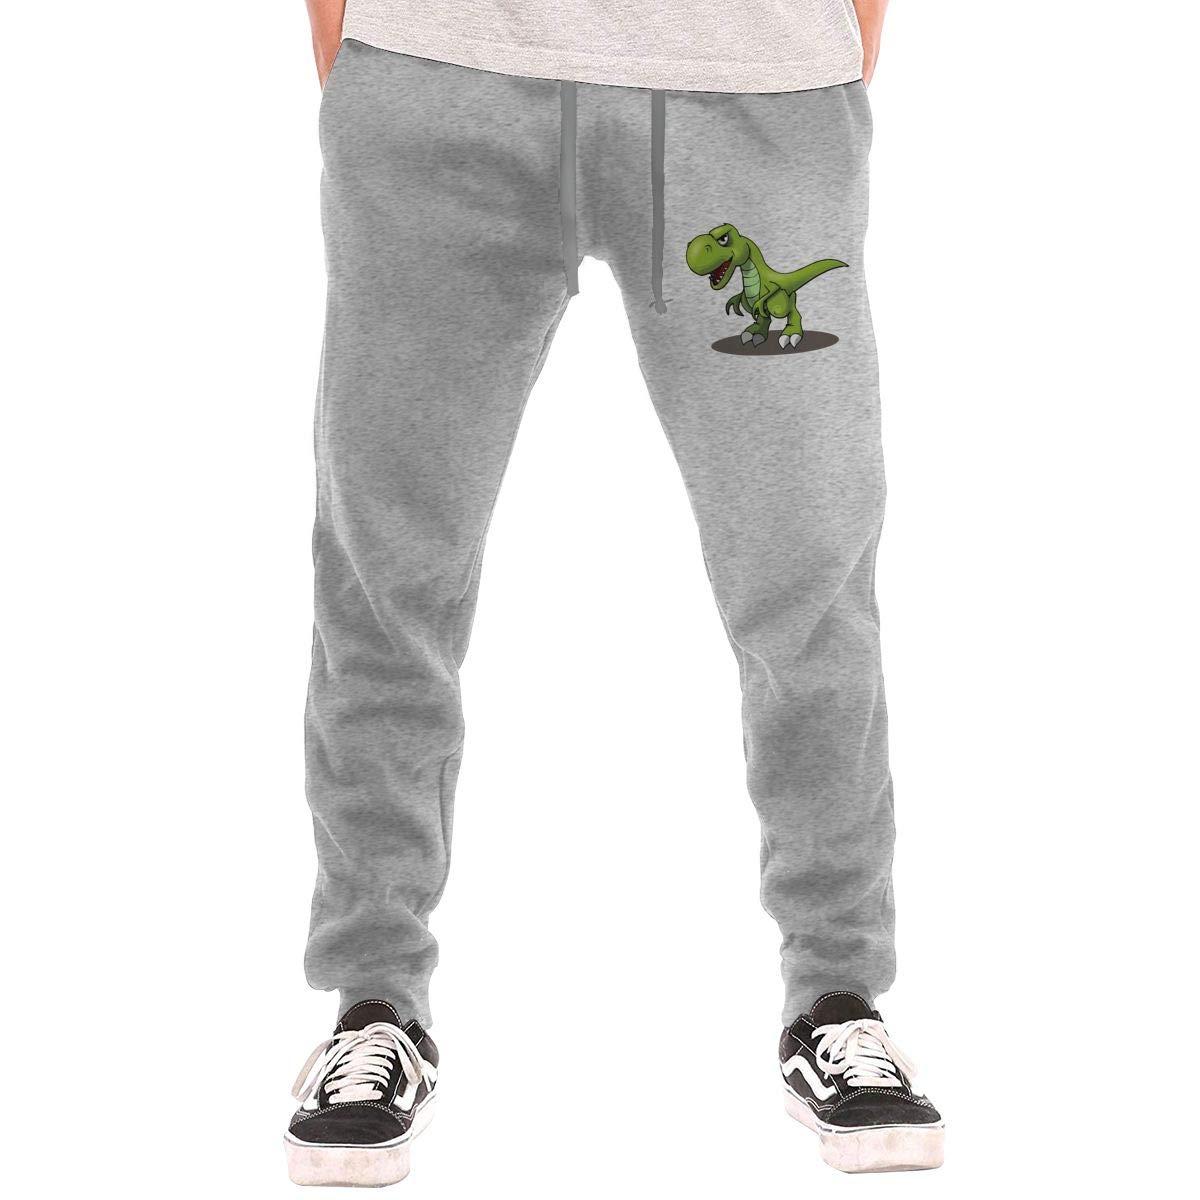 BInfef Cartoon Green Dinosaur Drawstring Waist,100/% Cotton,Elastic Waist Cuffed,Jogger Sweatpants